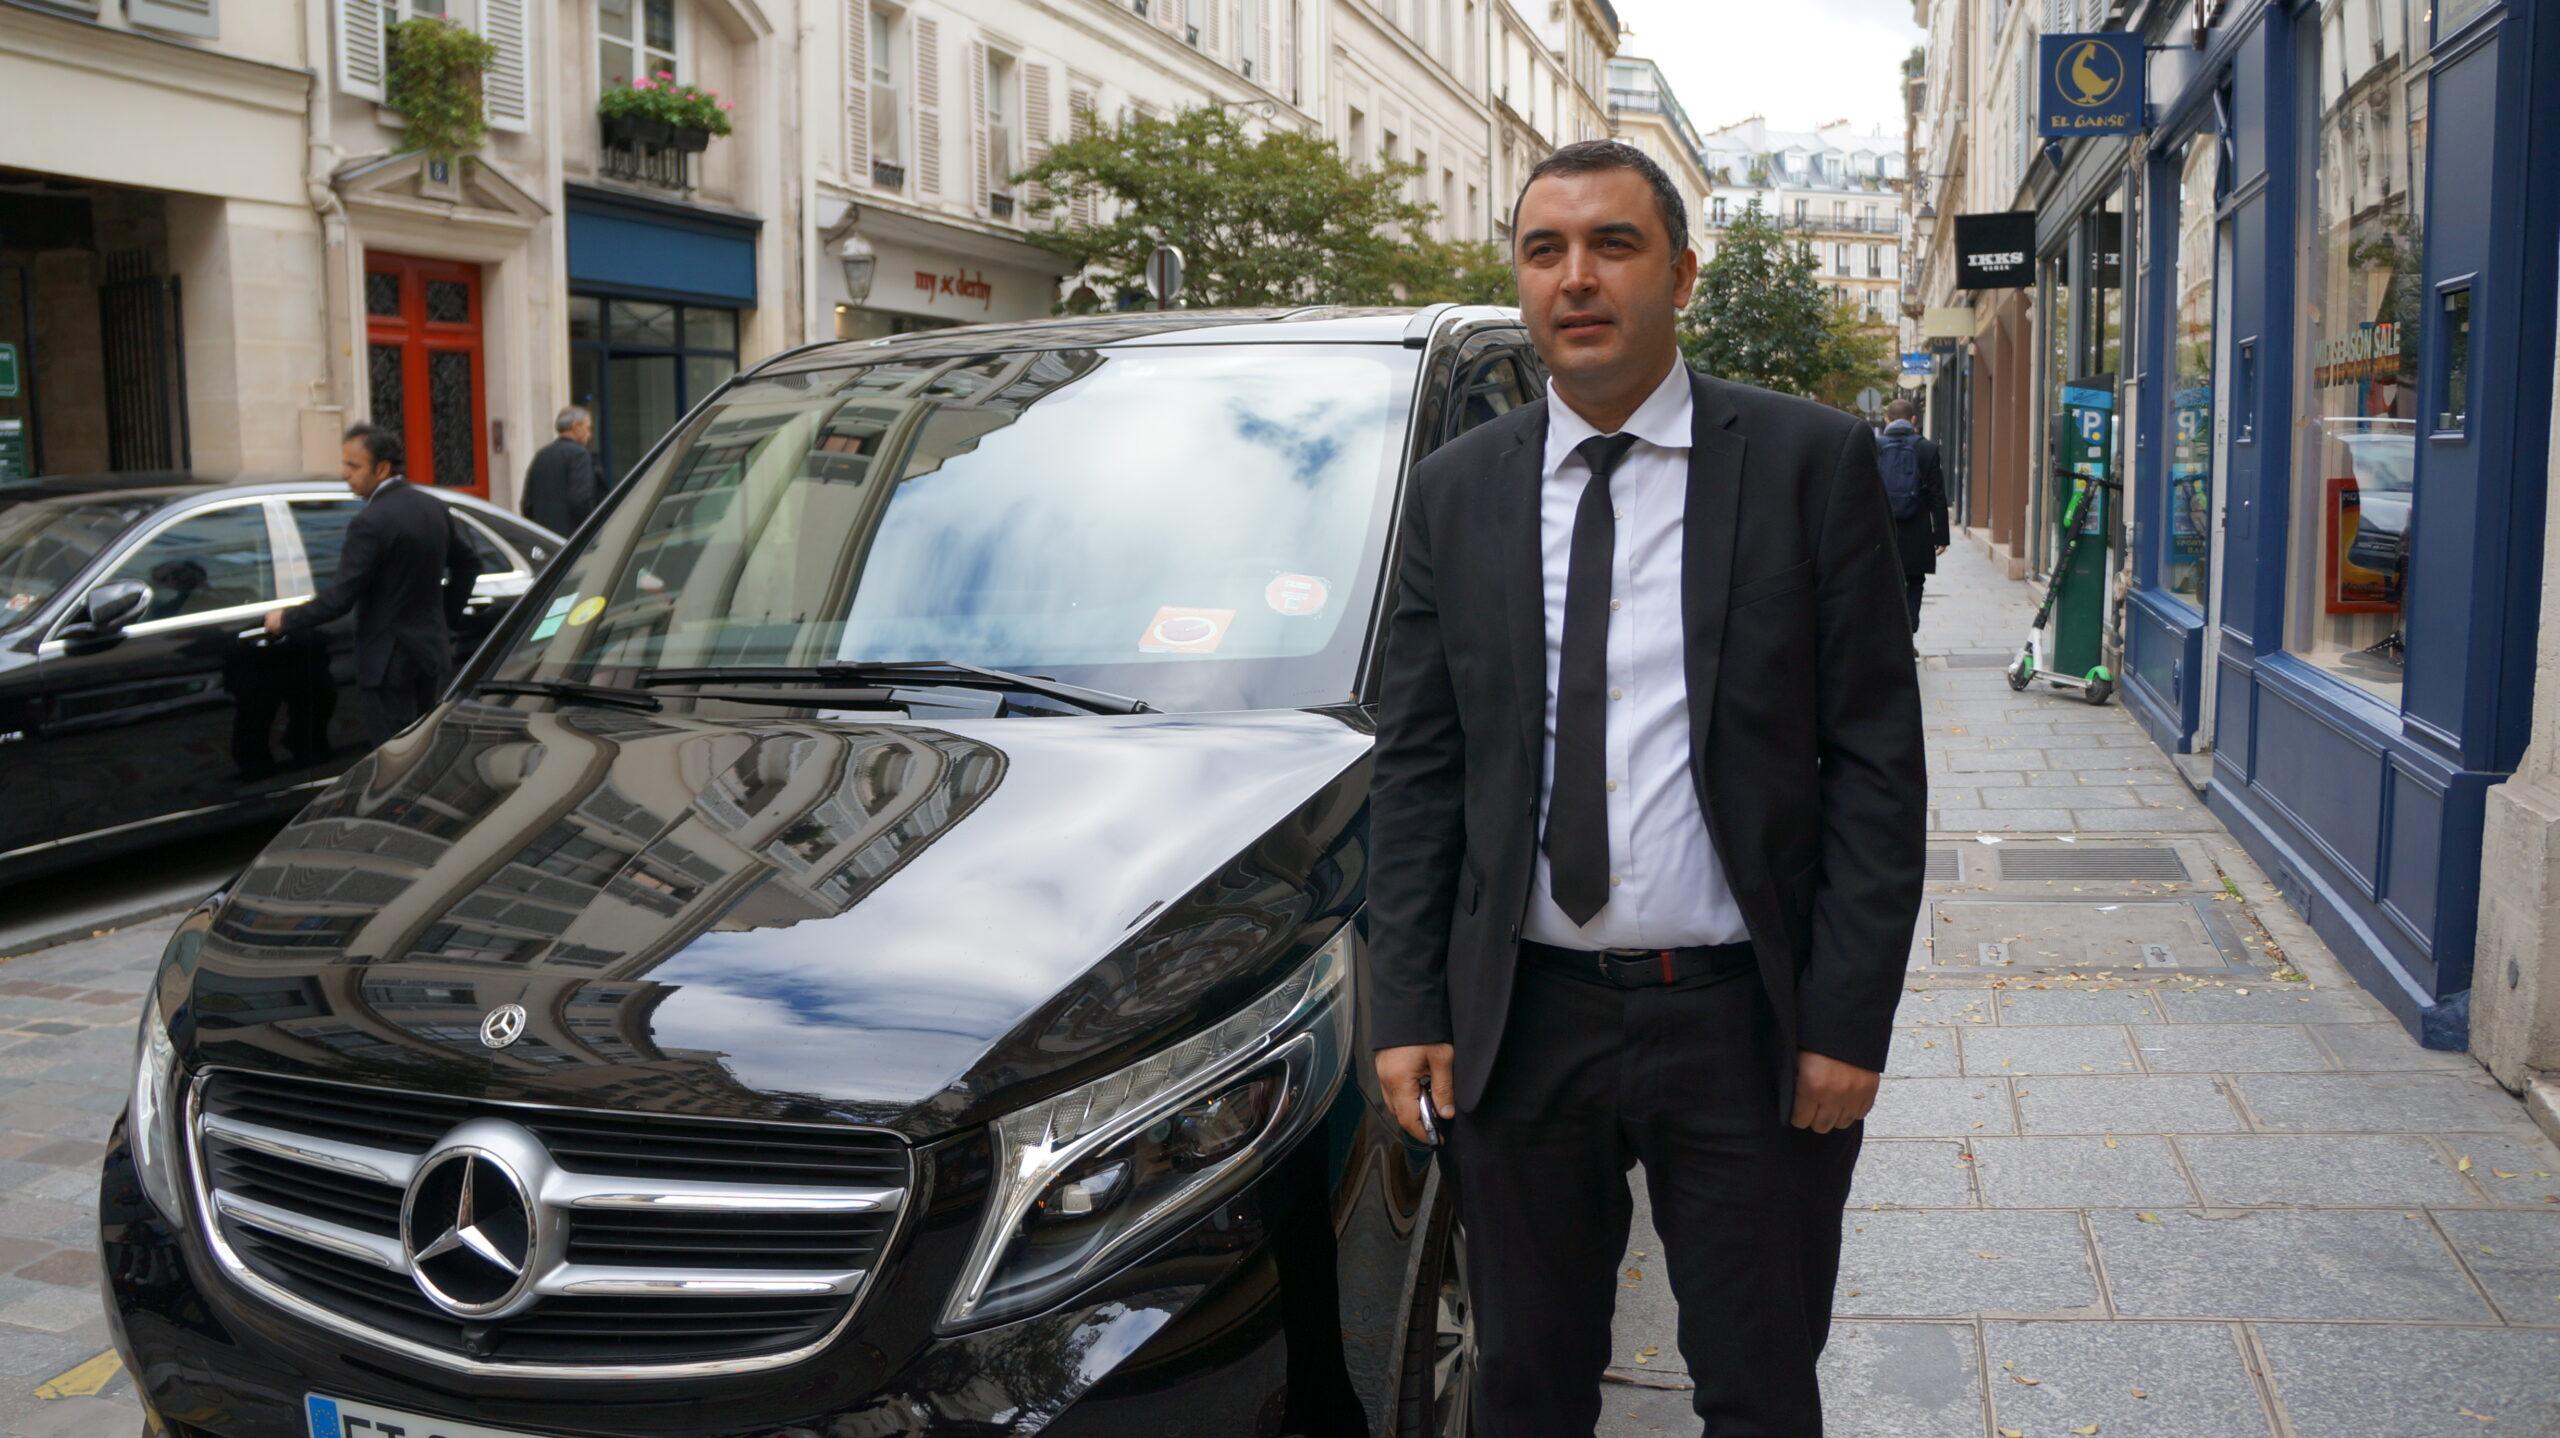 Sam Driver Paris Rue des Rosiers 2